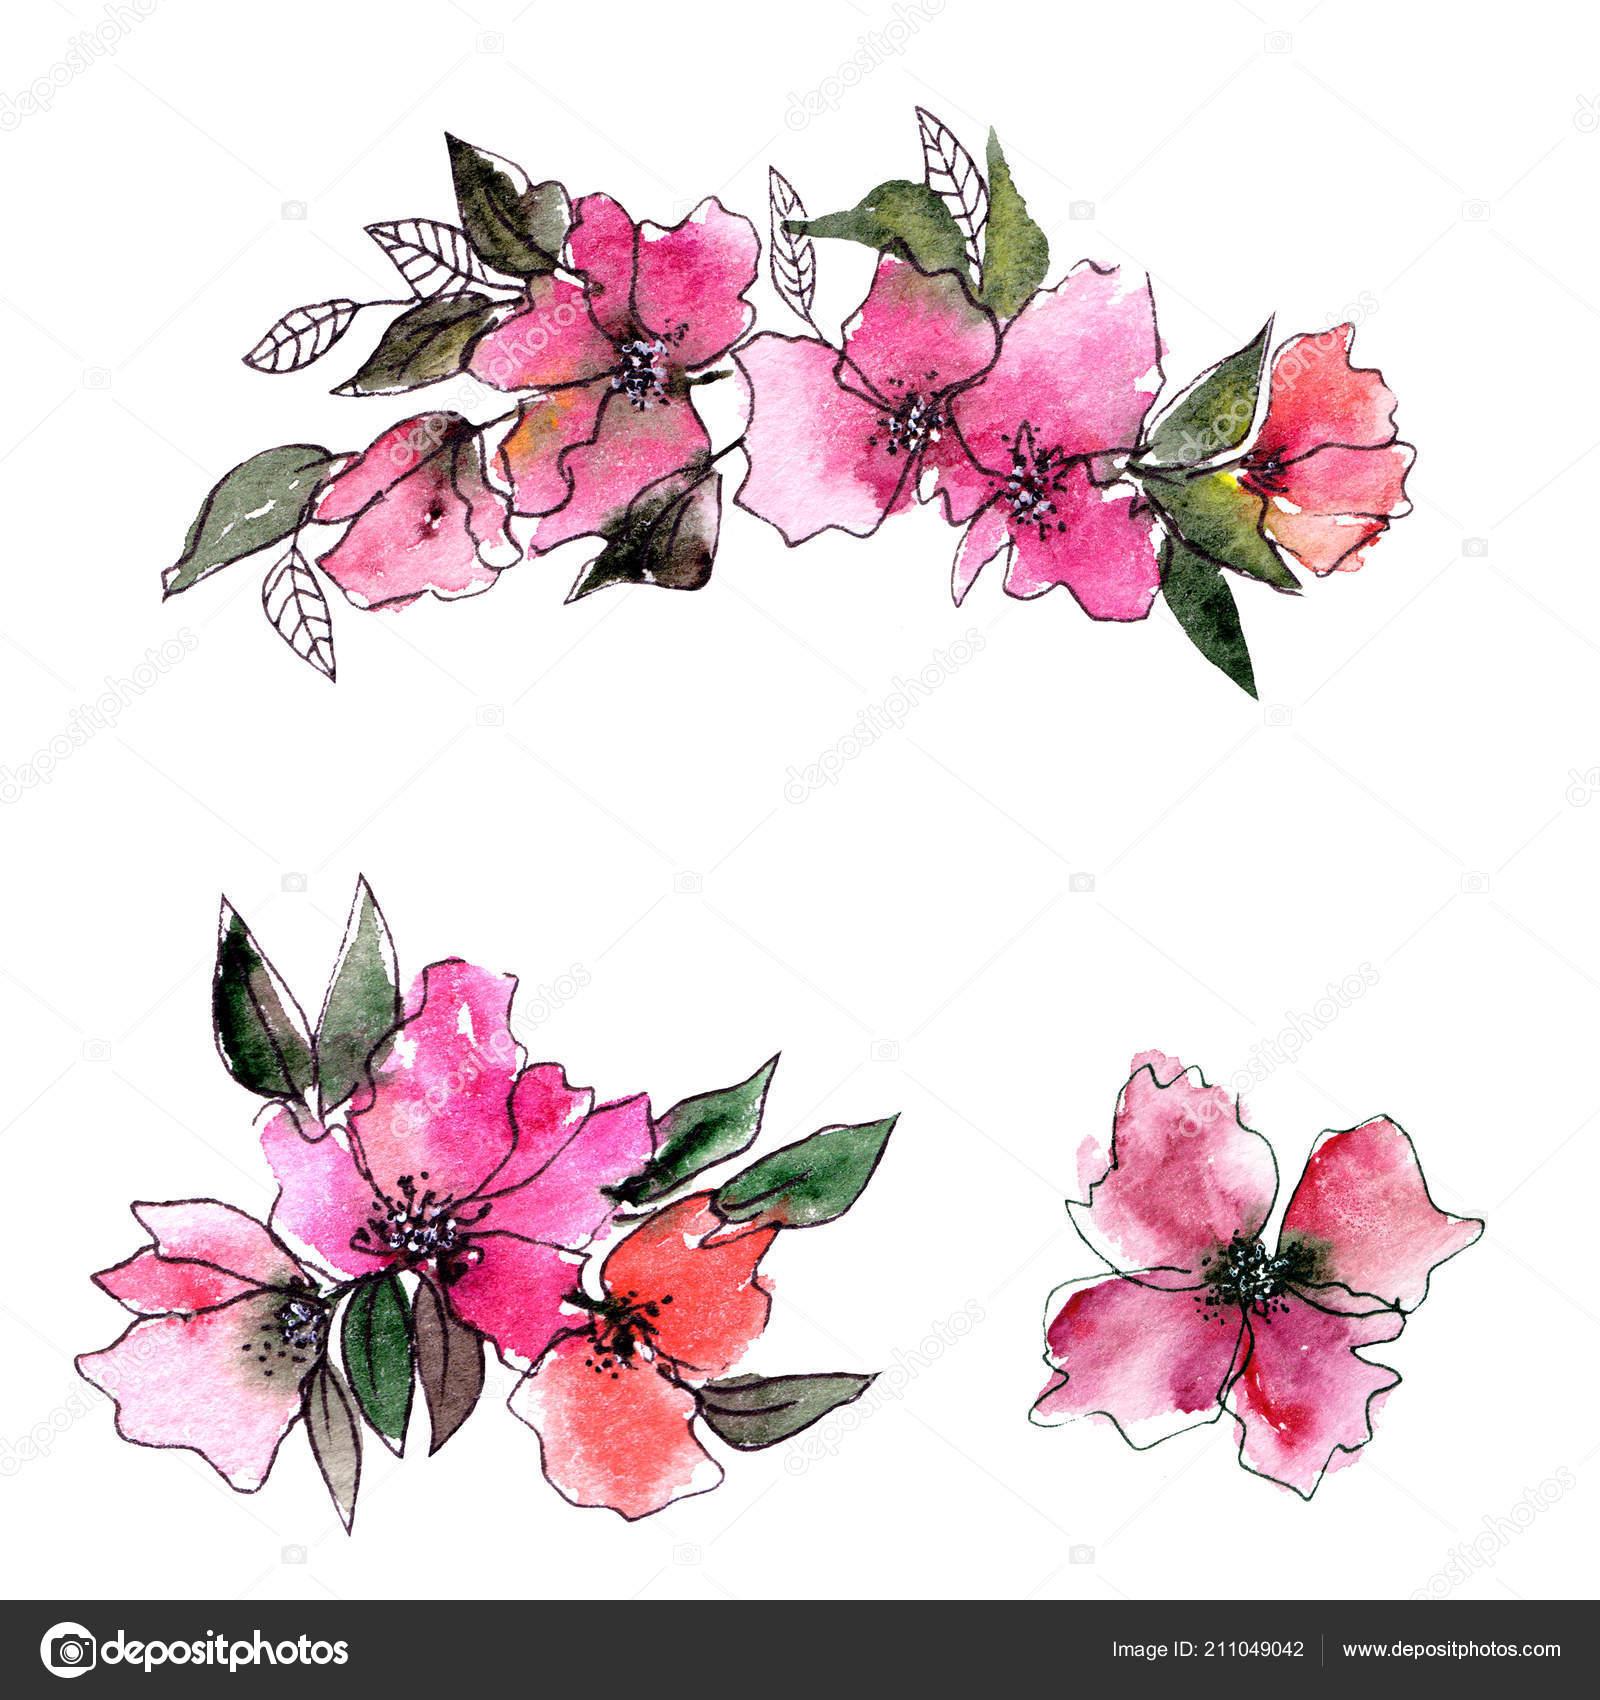 Floral Decorative Elements Watercolor Floral Decor Greeting Card